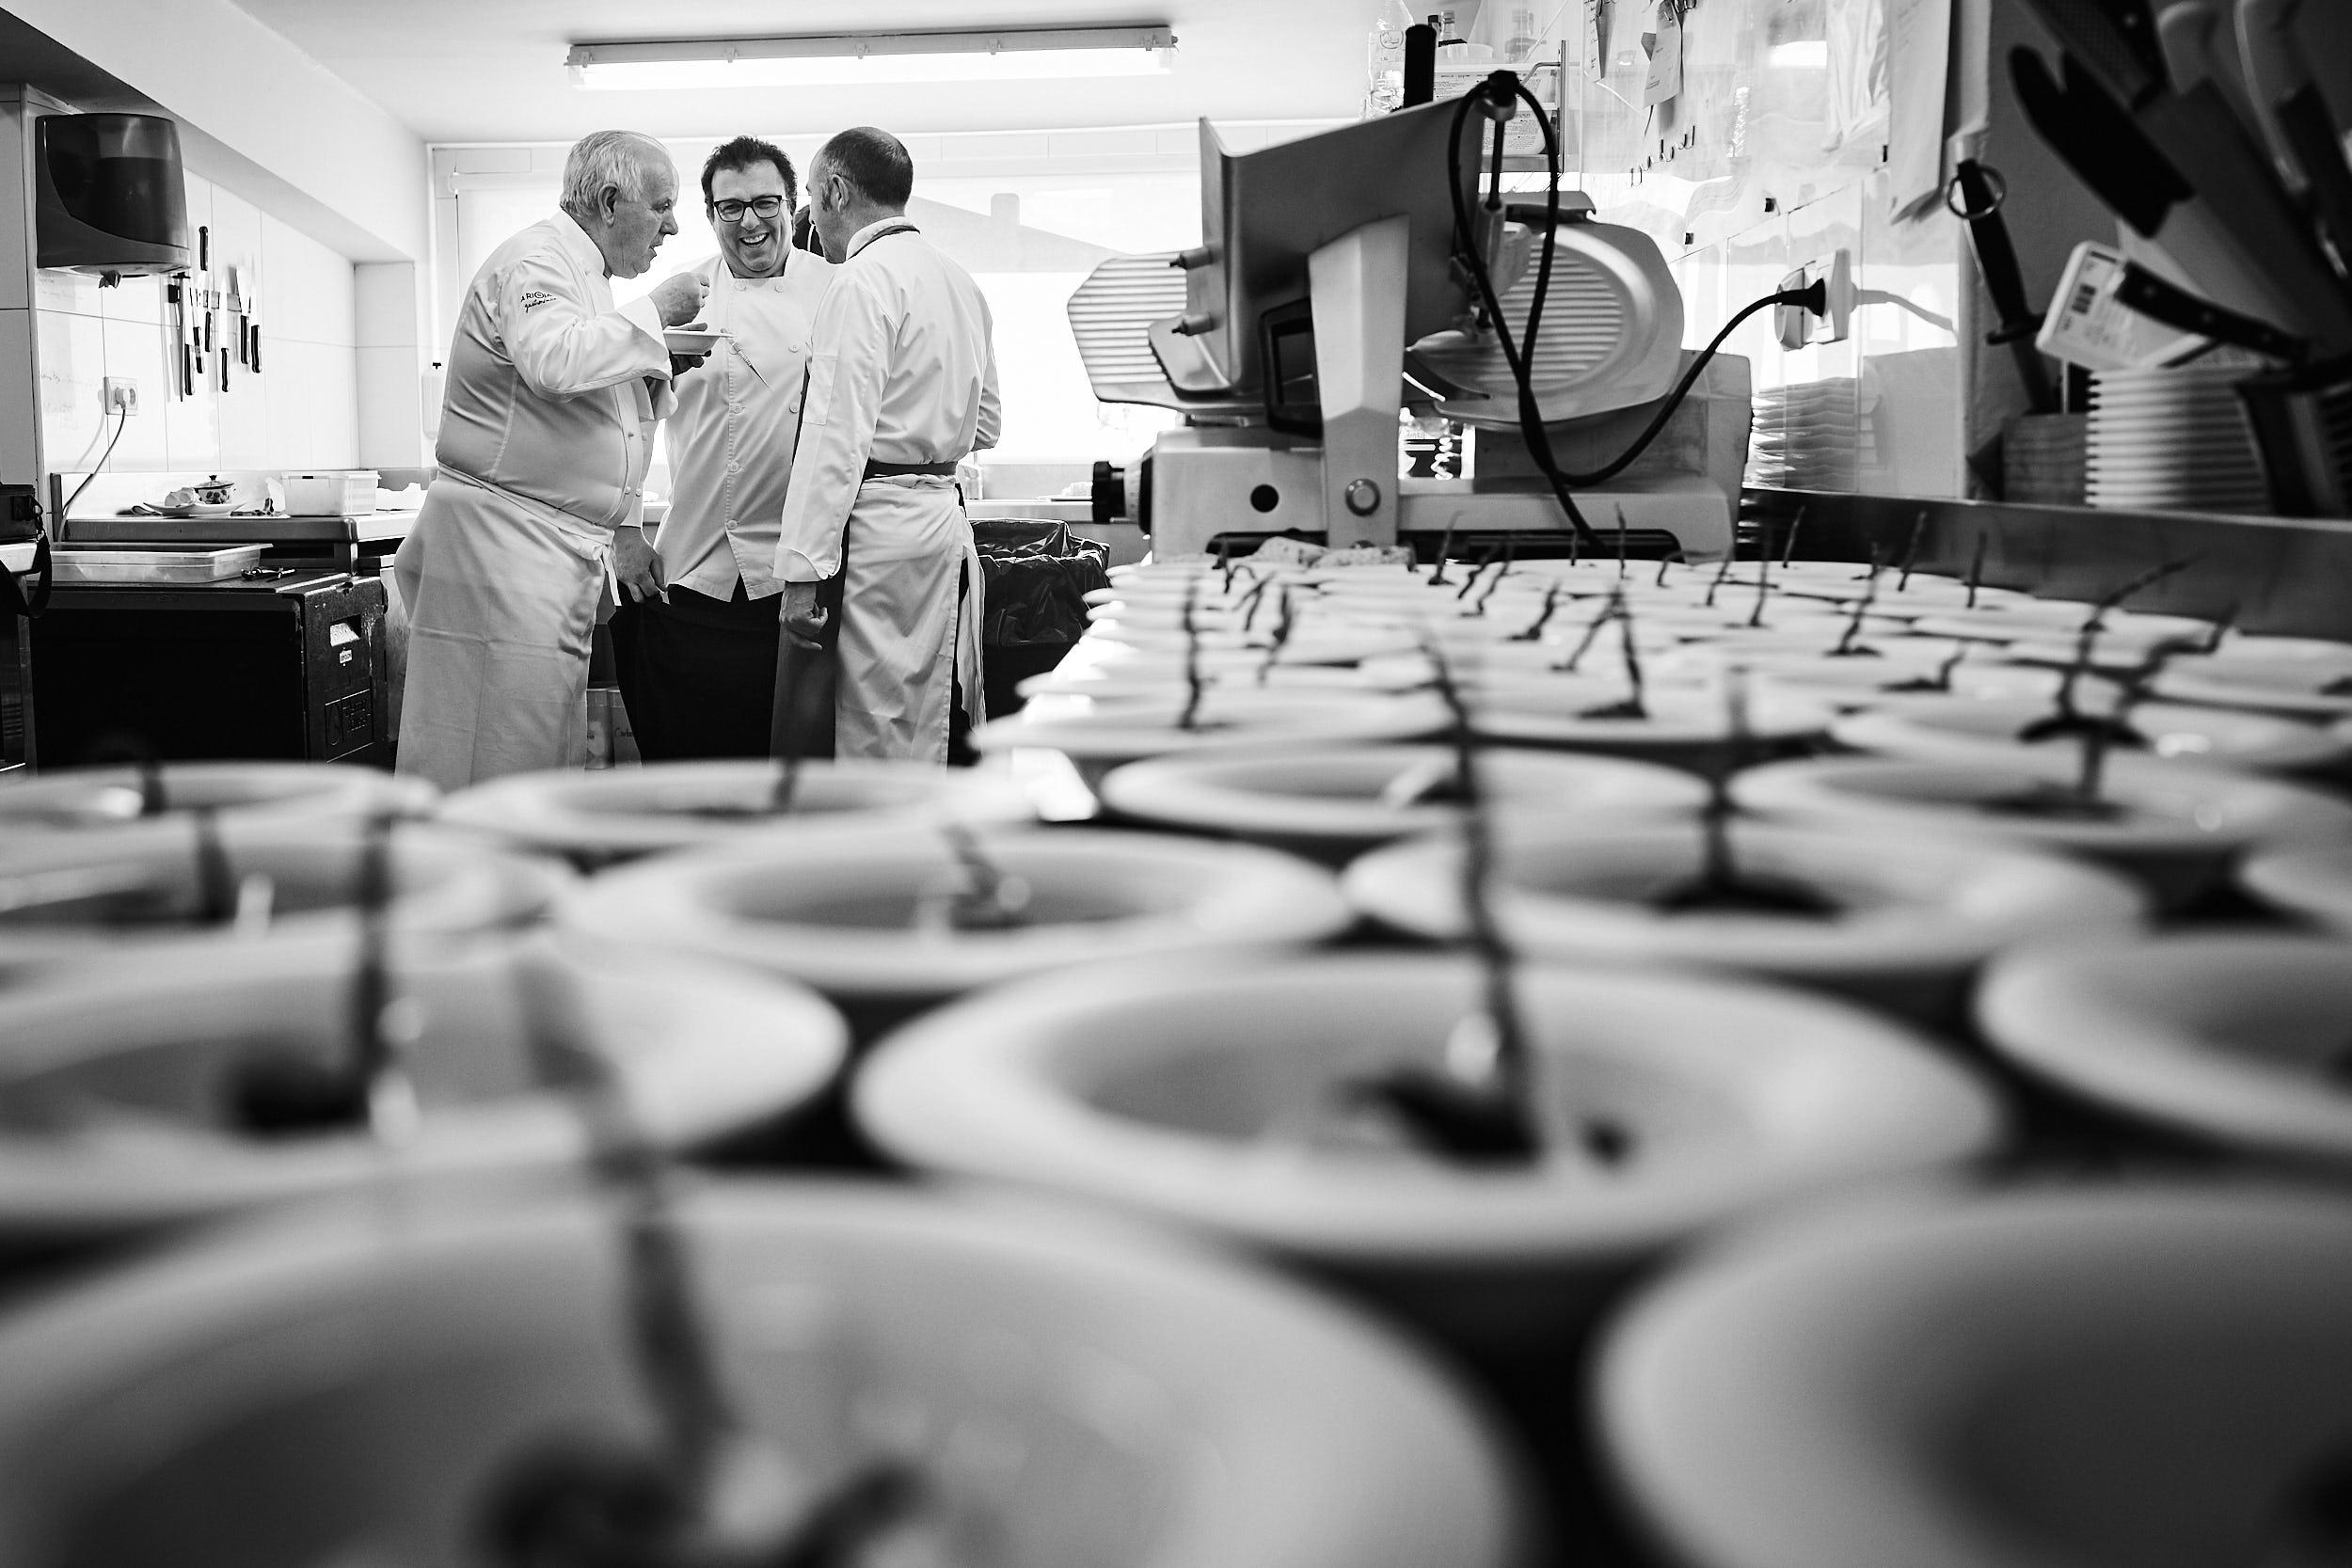 1903Restaurante_La_Vieja_Bodega_Casalarreina_La_Rioja_Spain_Sturcke_0013.jpg